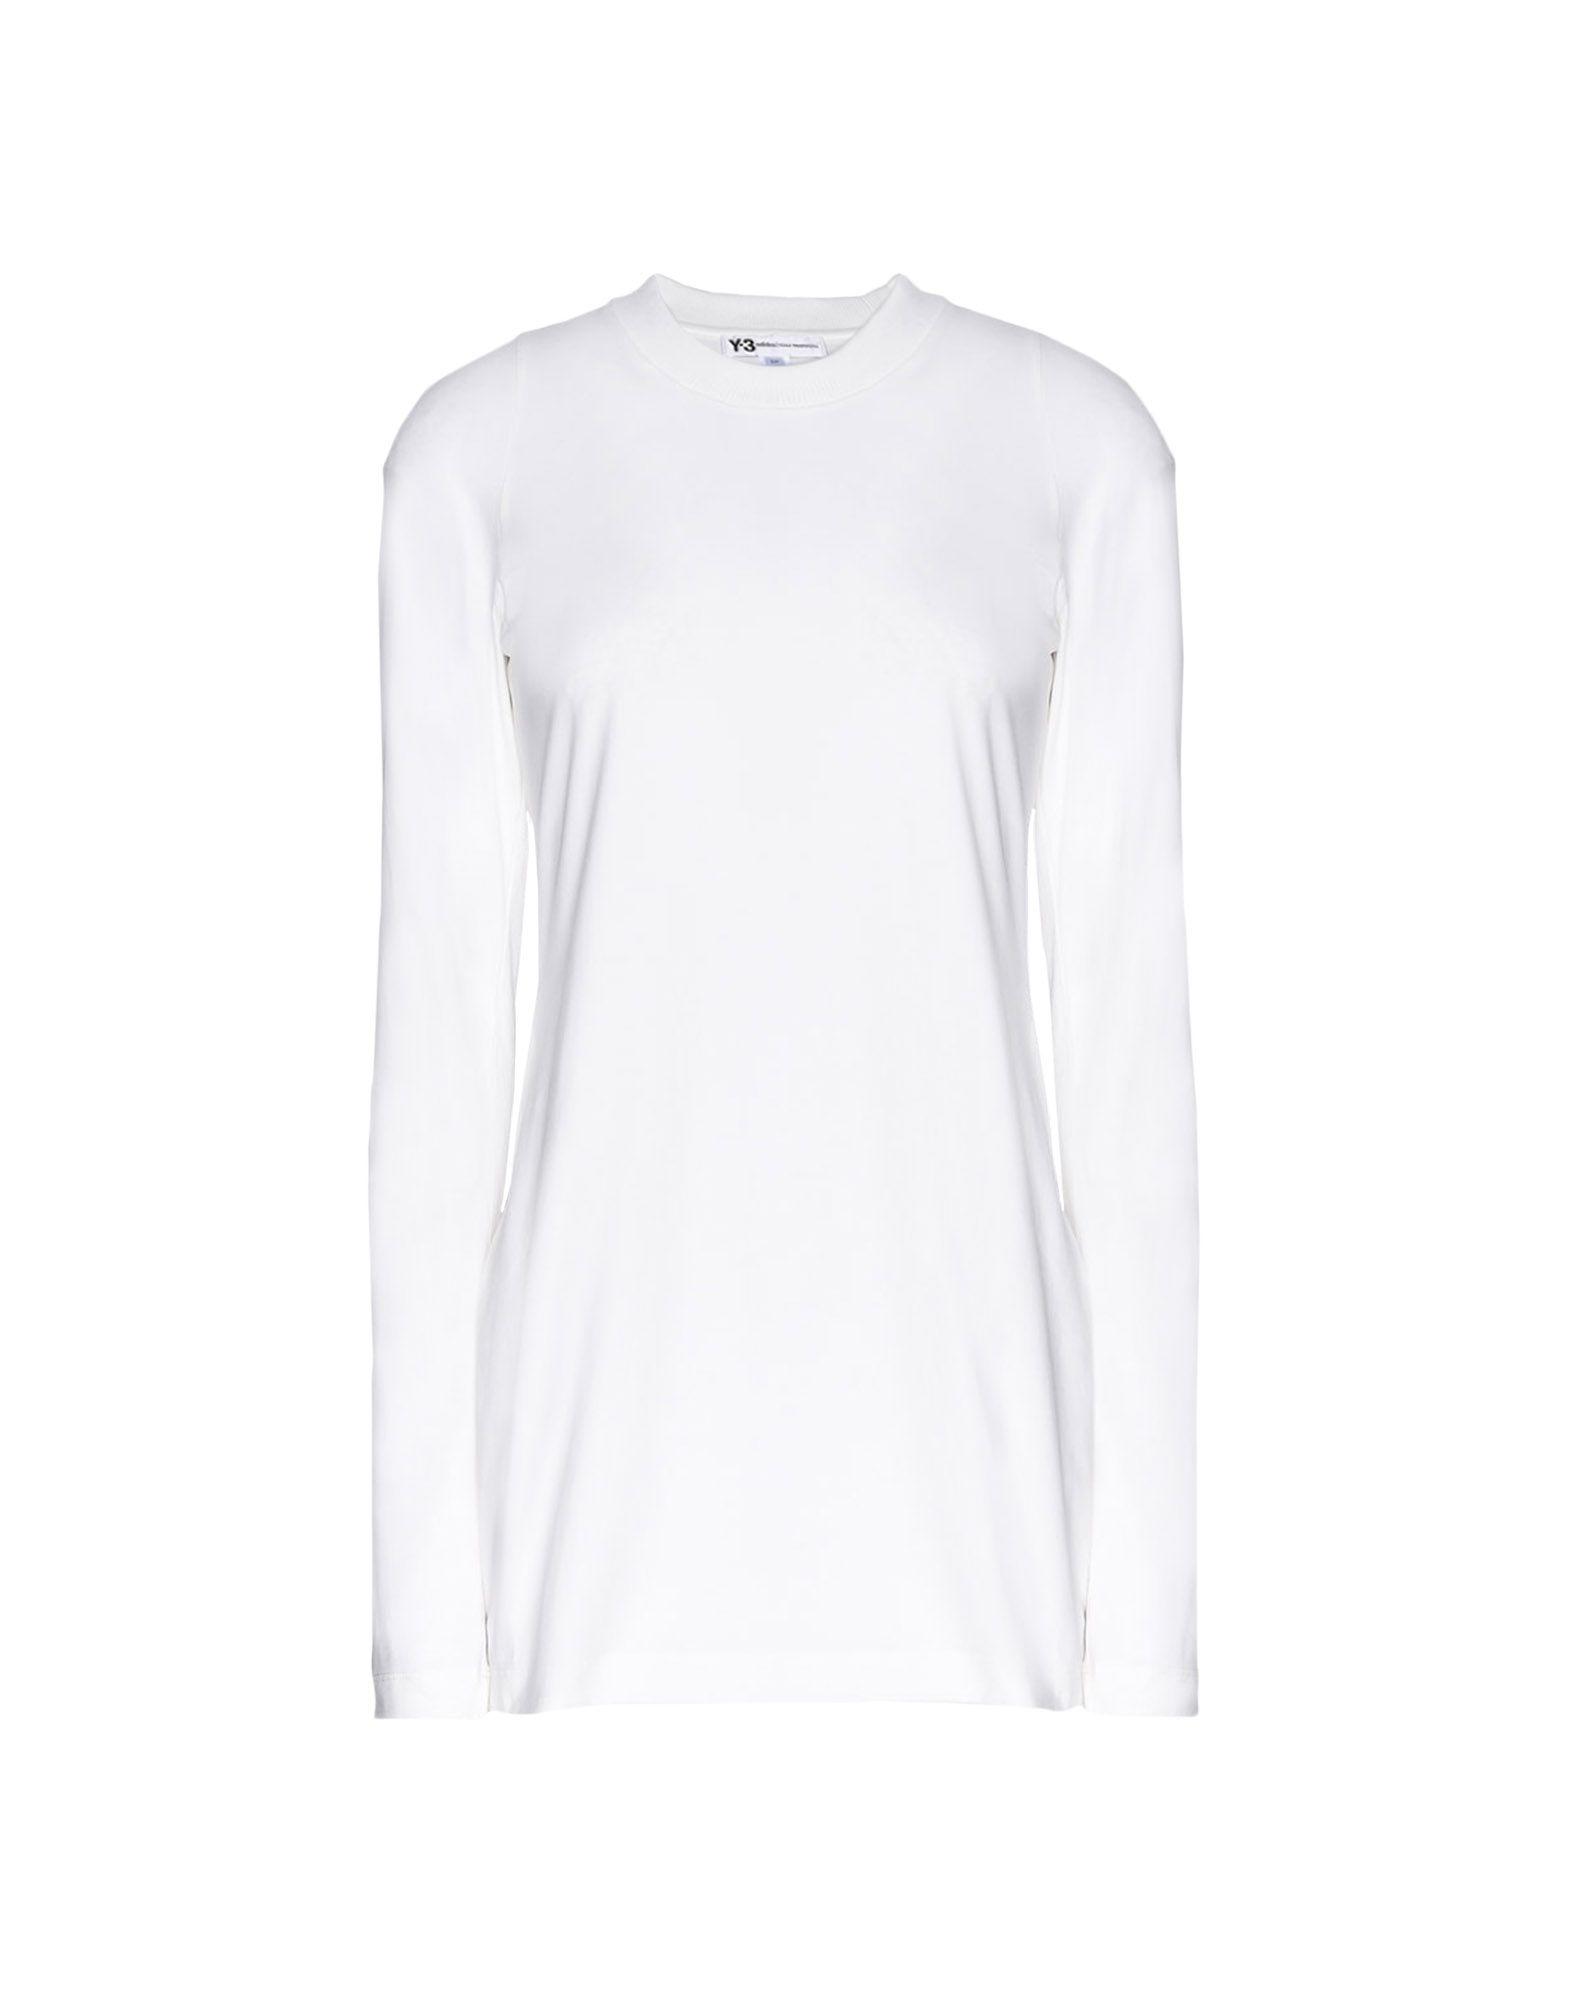 Y-3 Y-3 Prime Tee Long sleeve t-shirt Woman f